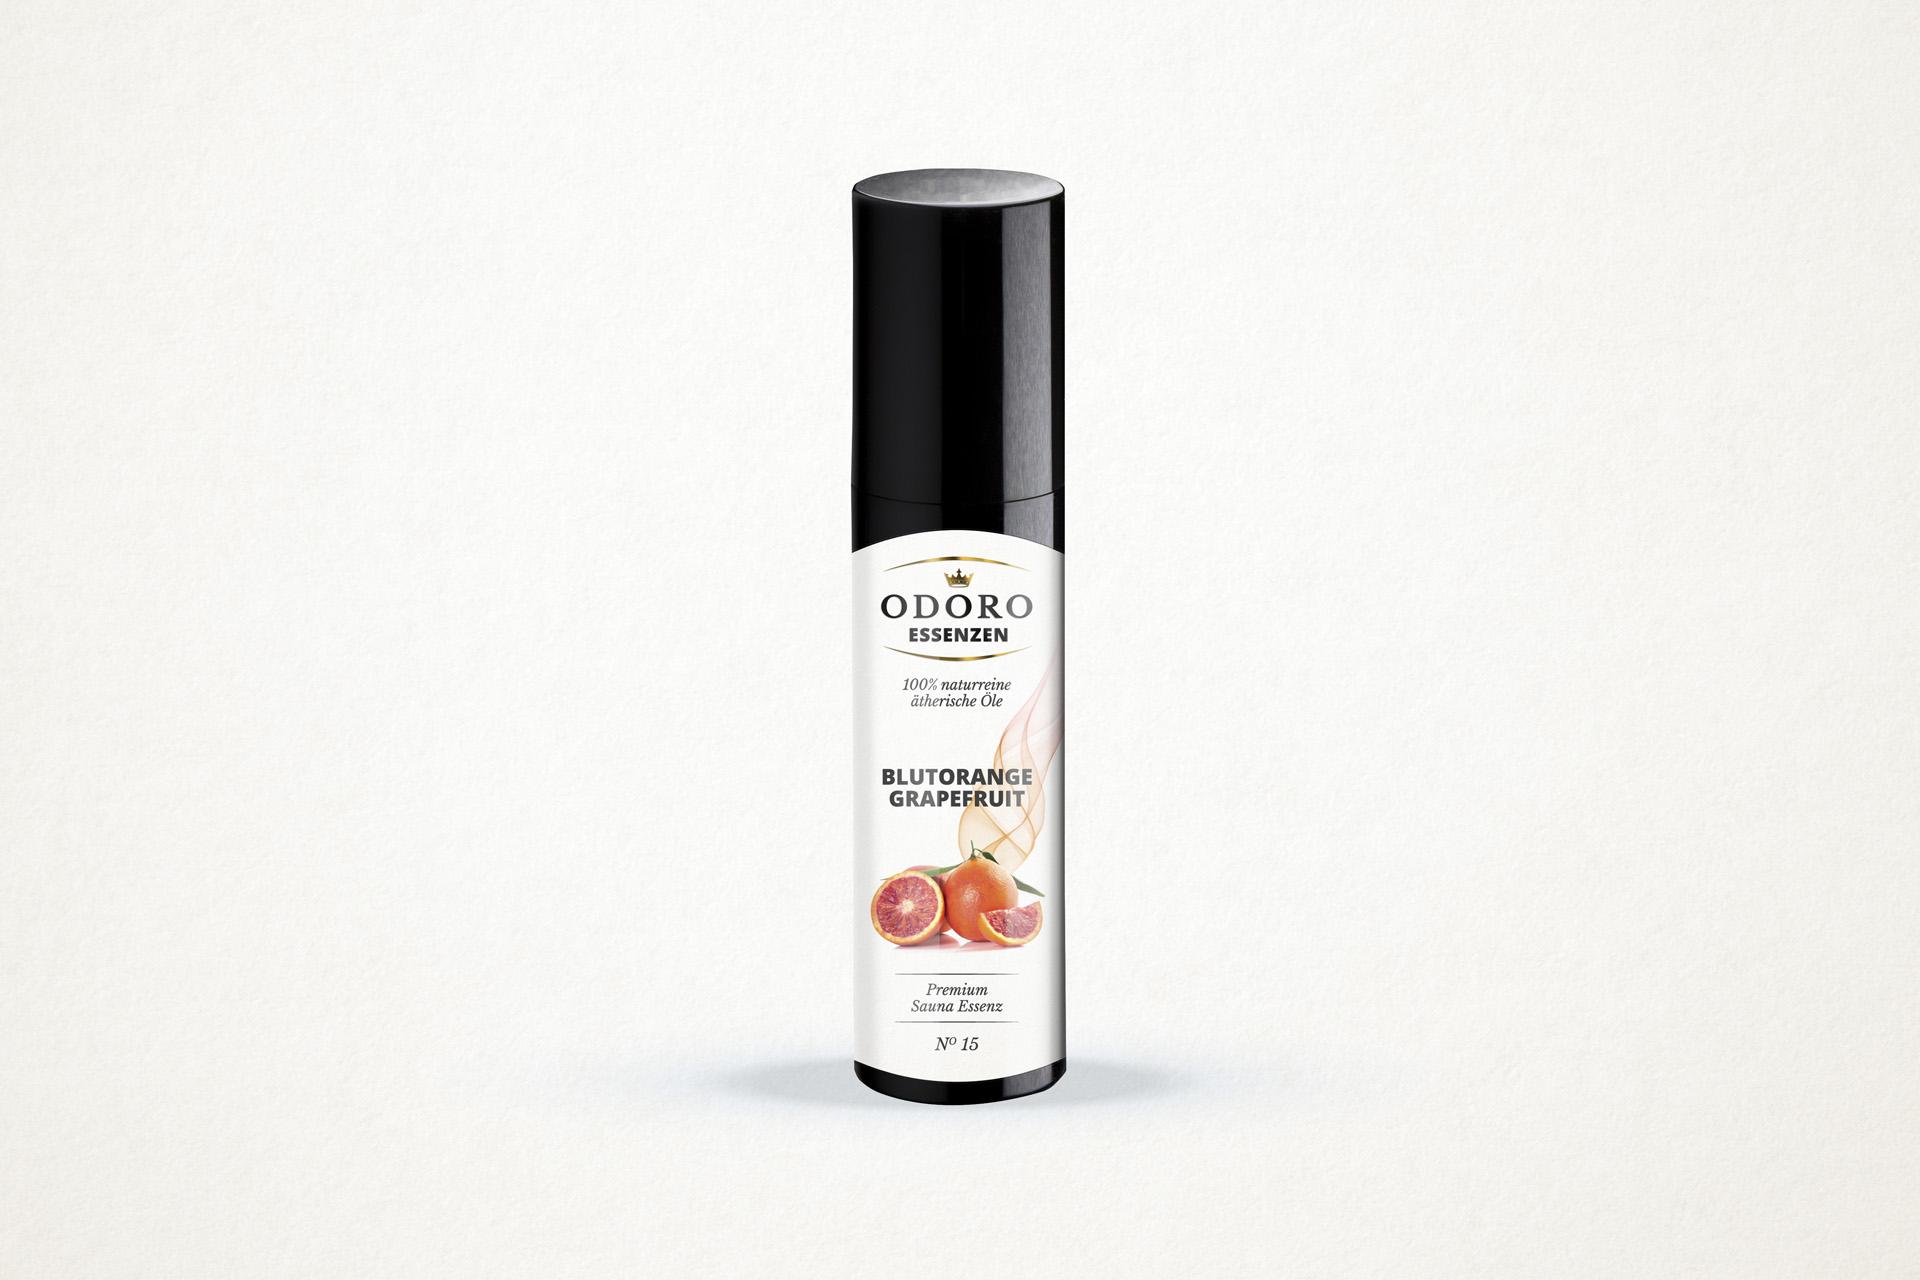 Saunaaufguss Blutorange Grapefruit